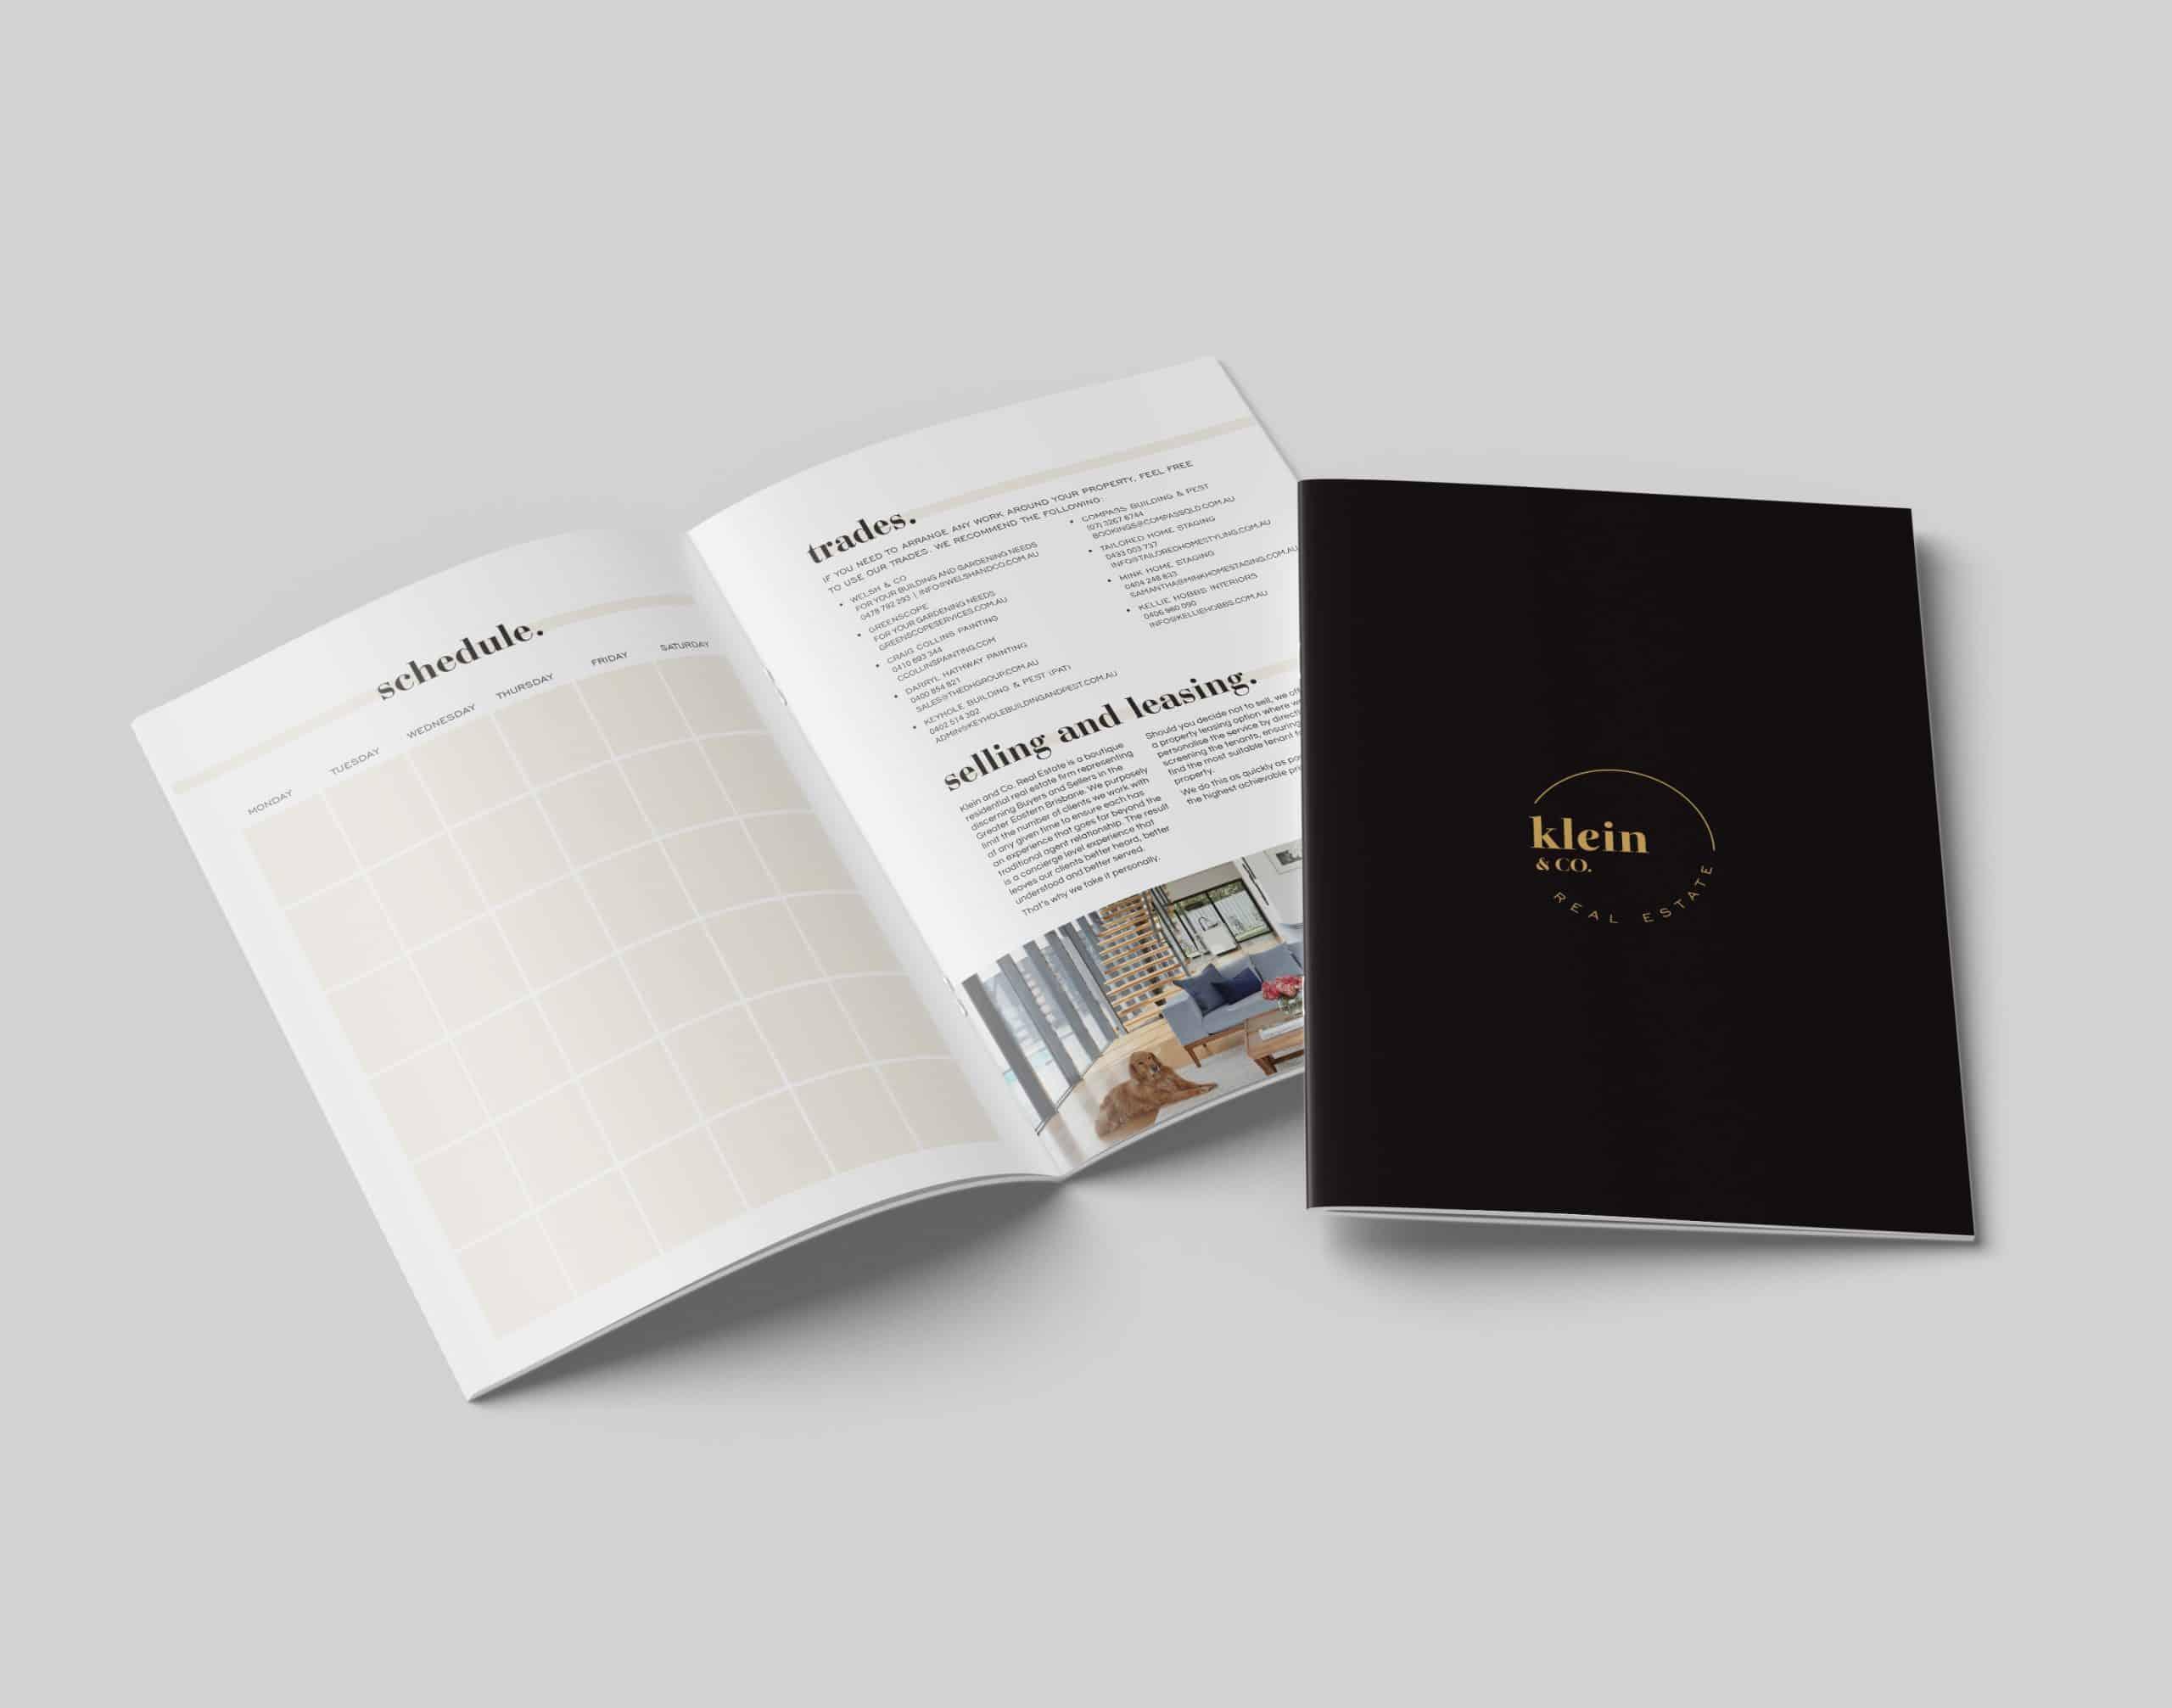 portfolio-klein-mockup-3